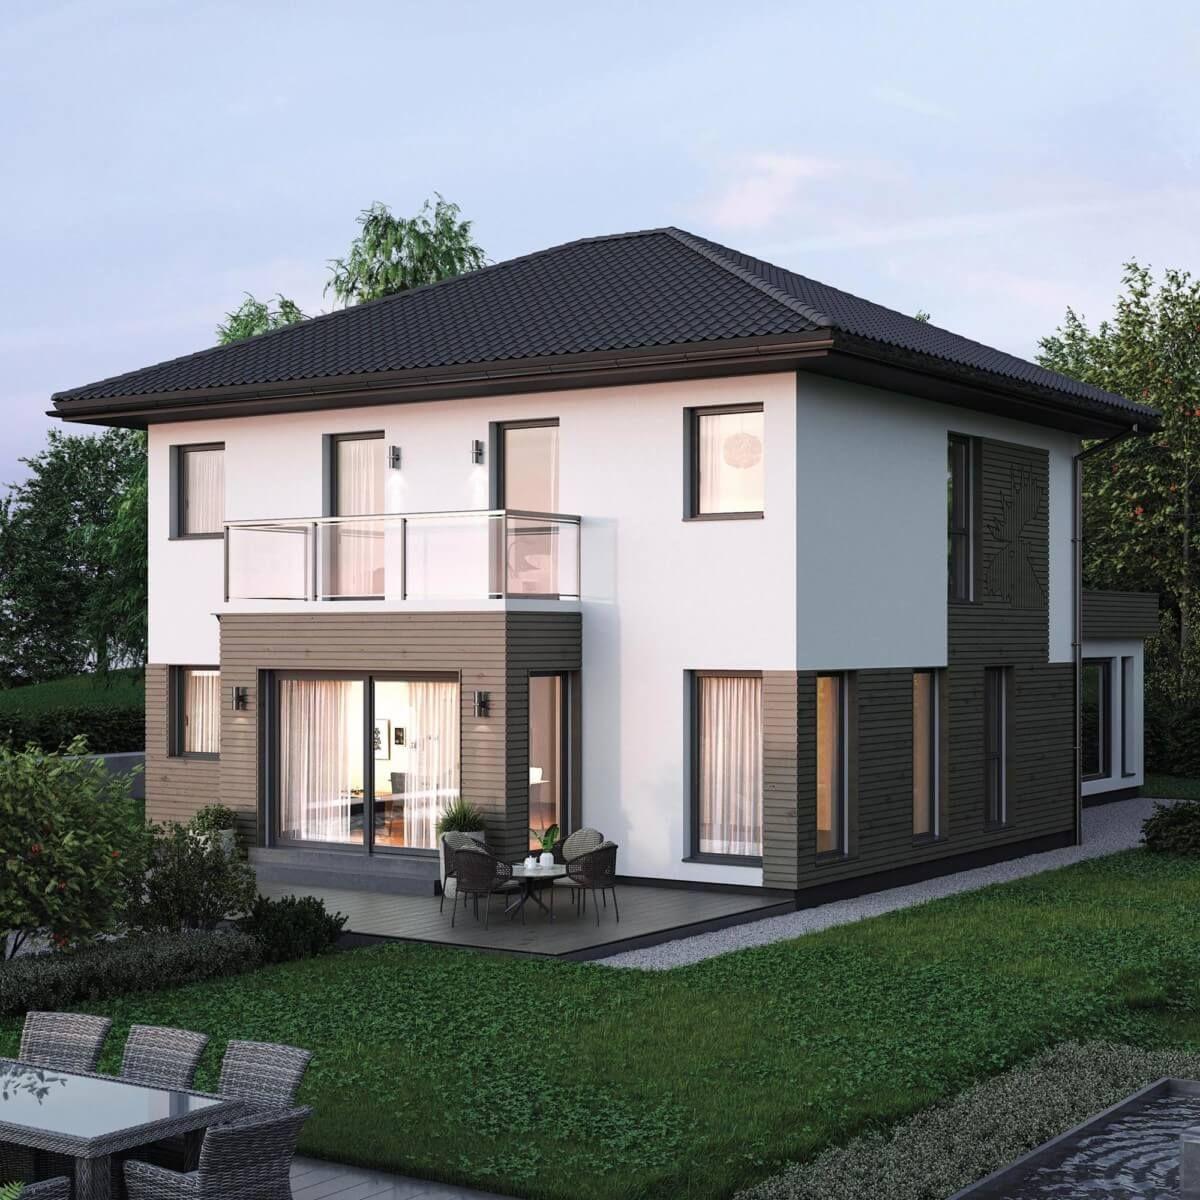 Stadtvilla modern mit Büro Anbau, Holz Fassade & Walmdach